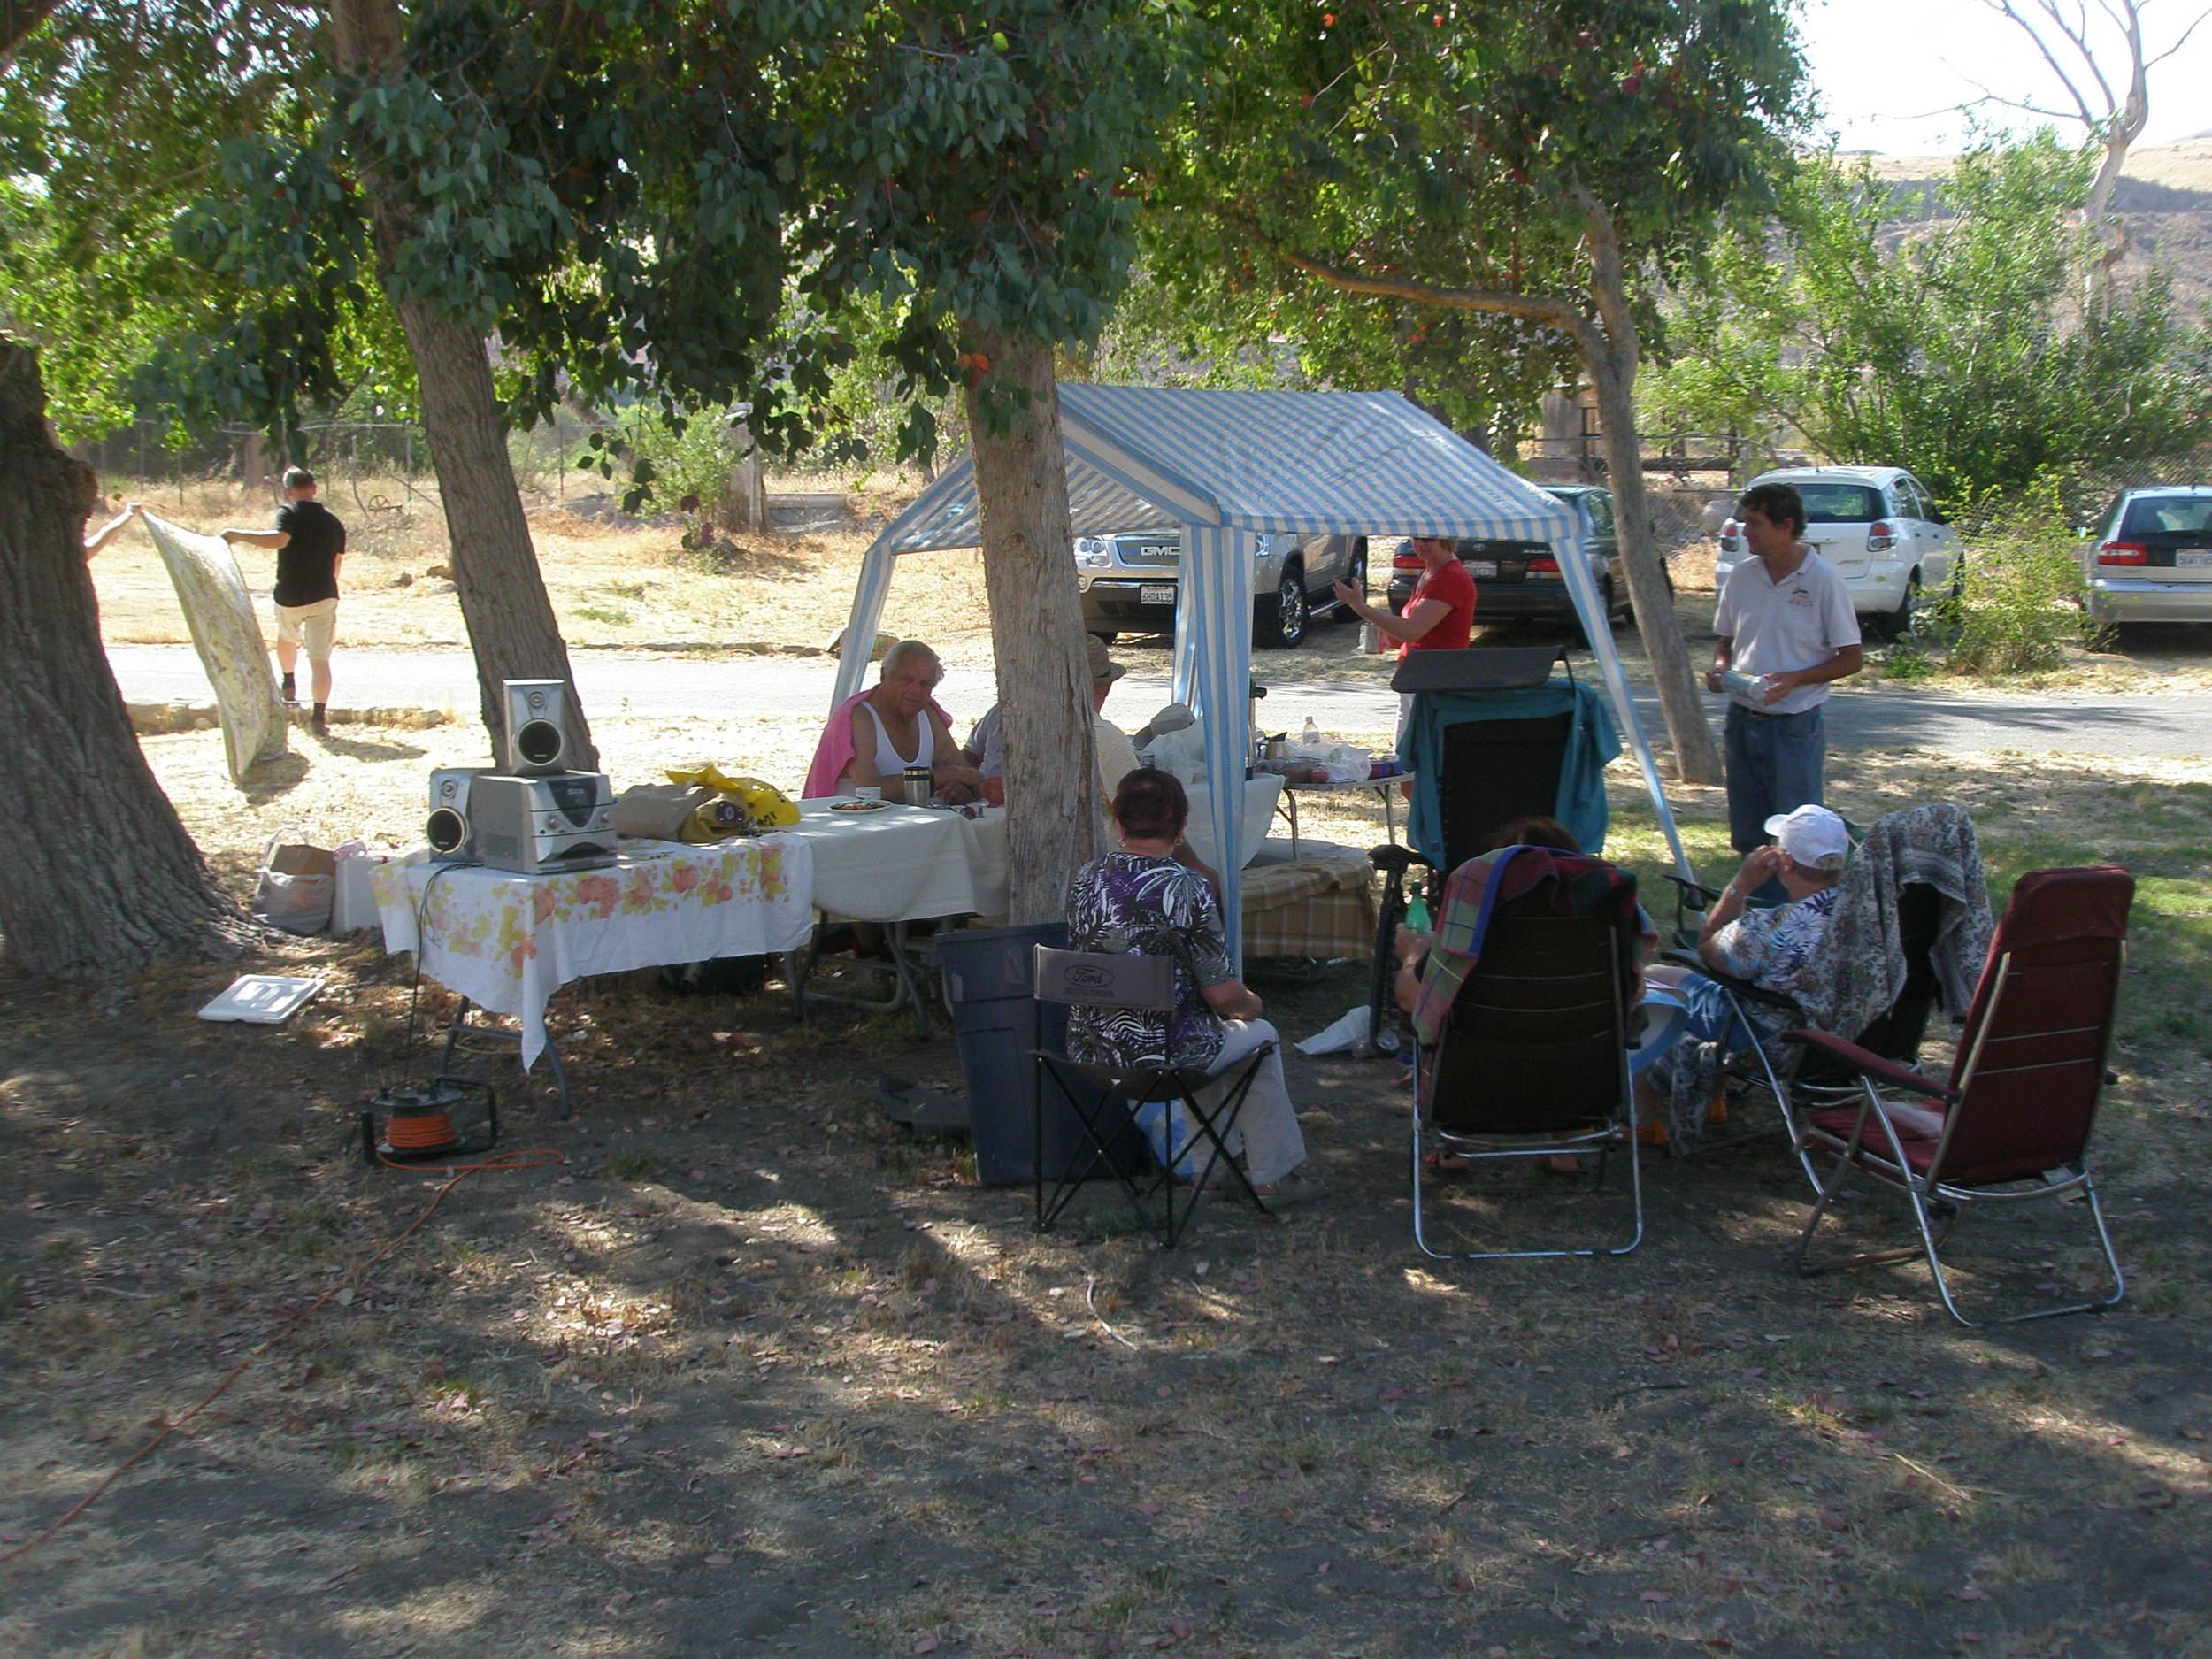 polish piknik 09 025.jpg